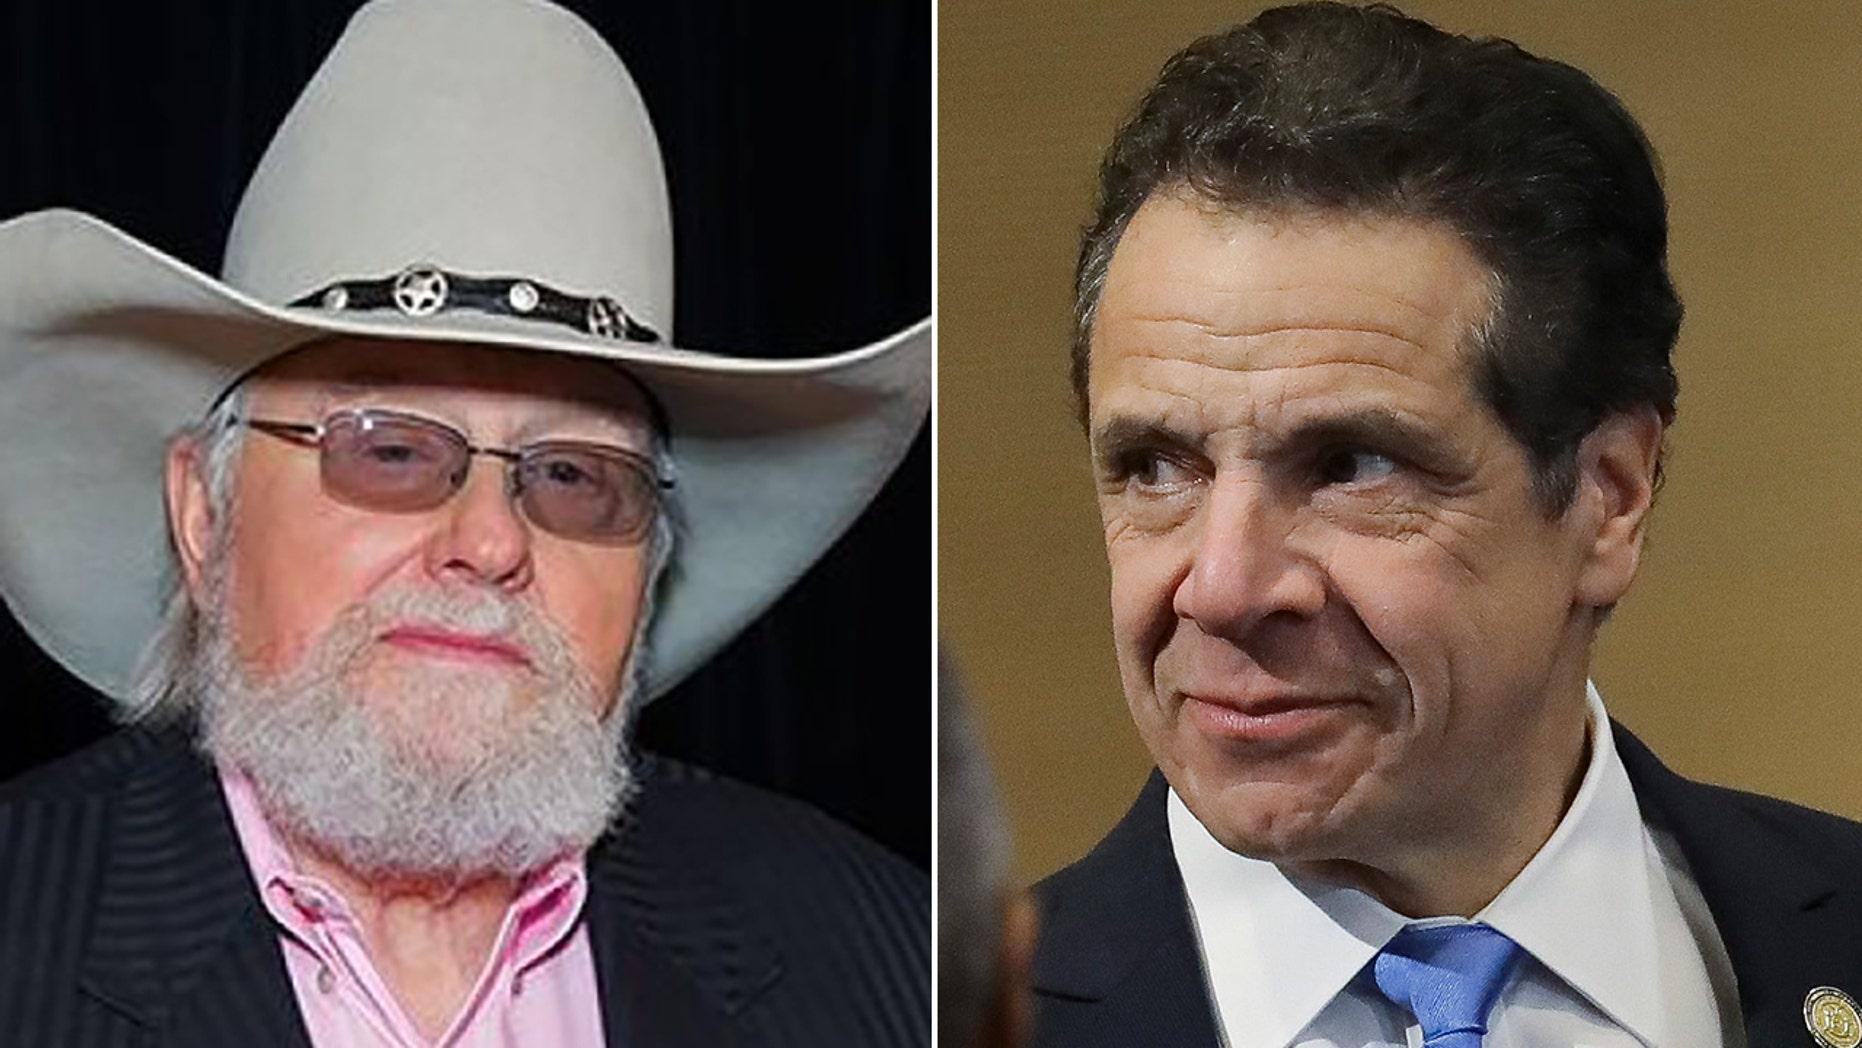 Charlie Daniels and Democratic New York Gov. Andrew Cuomo.